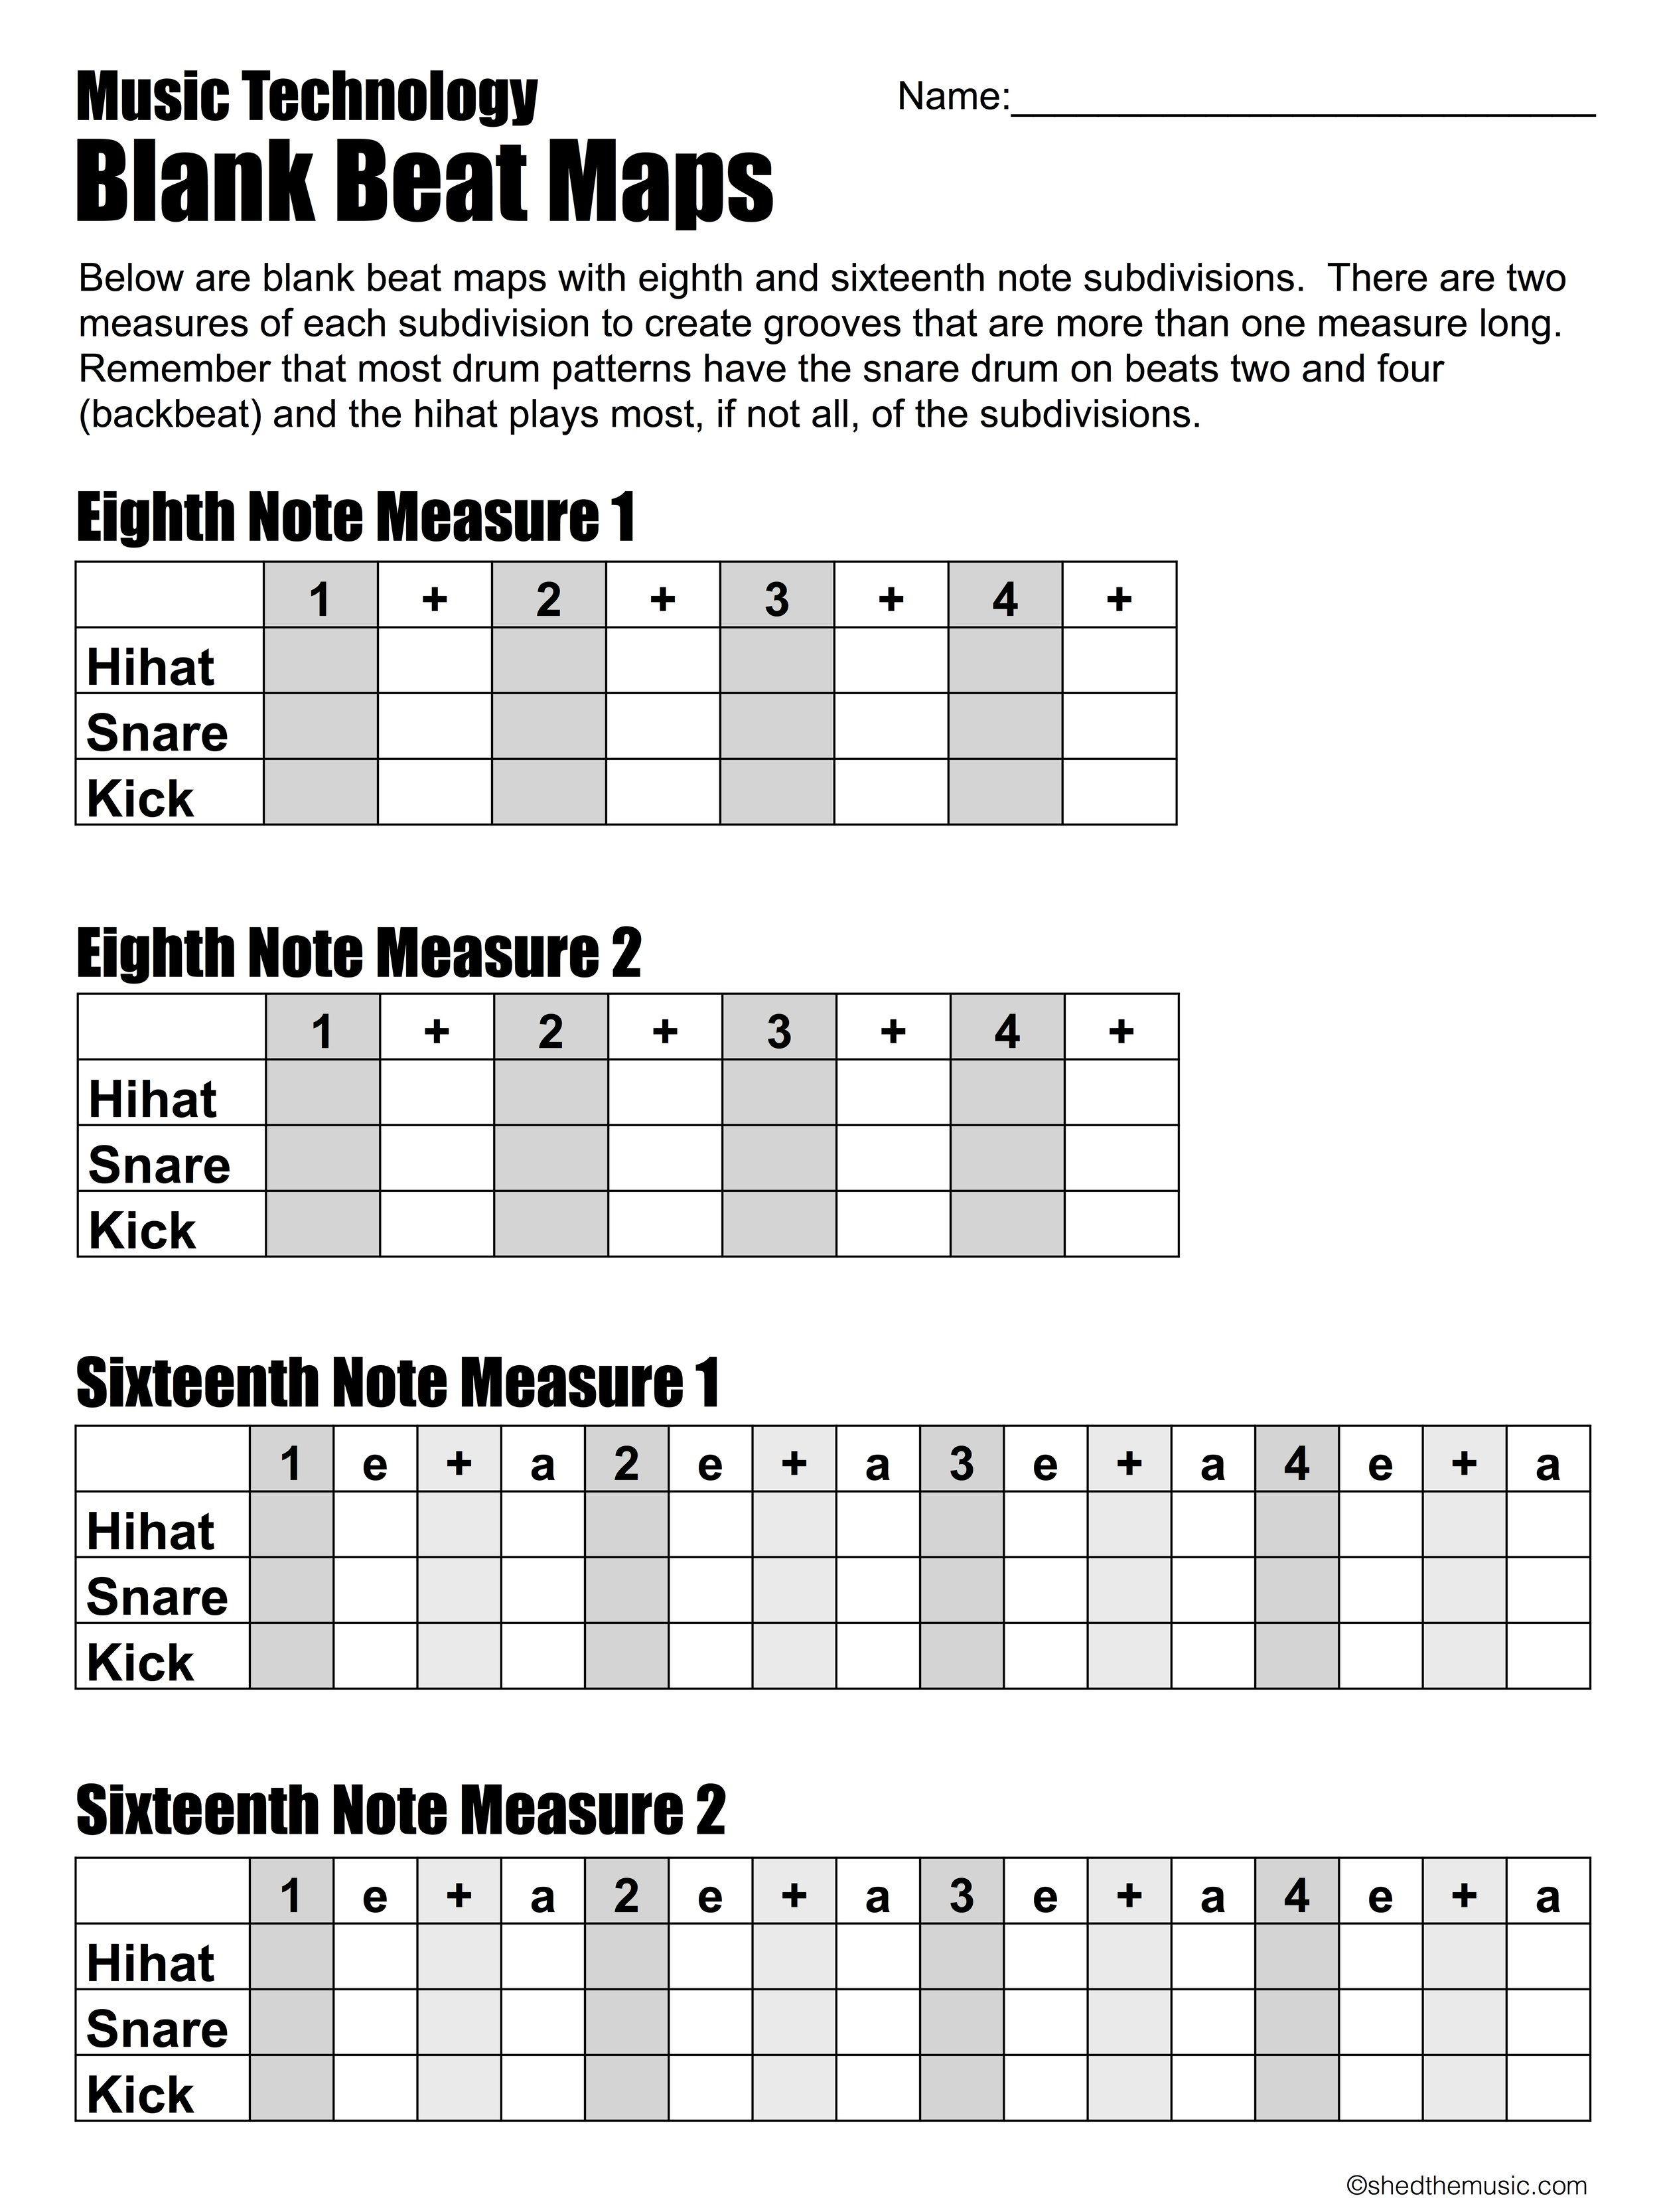 Blank Beat Maps The Shed Music Theory Music Technology Mood